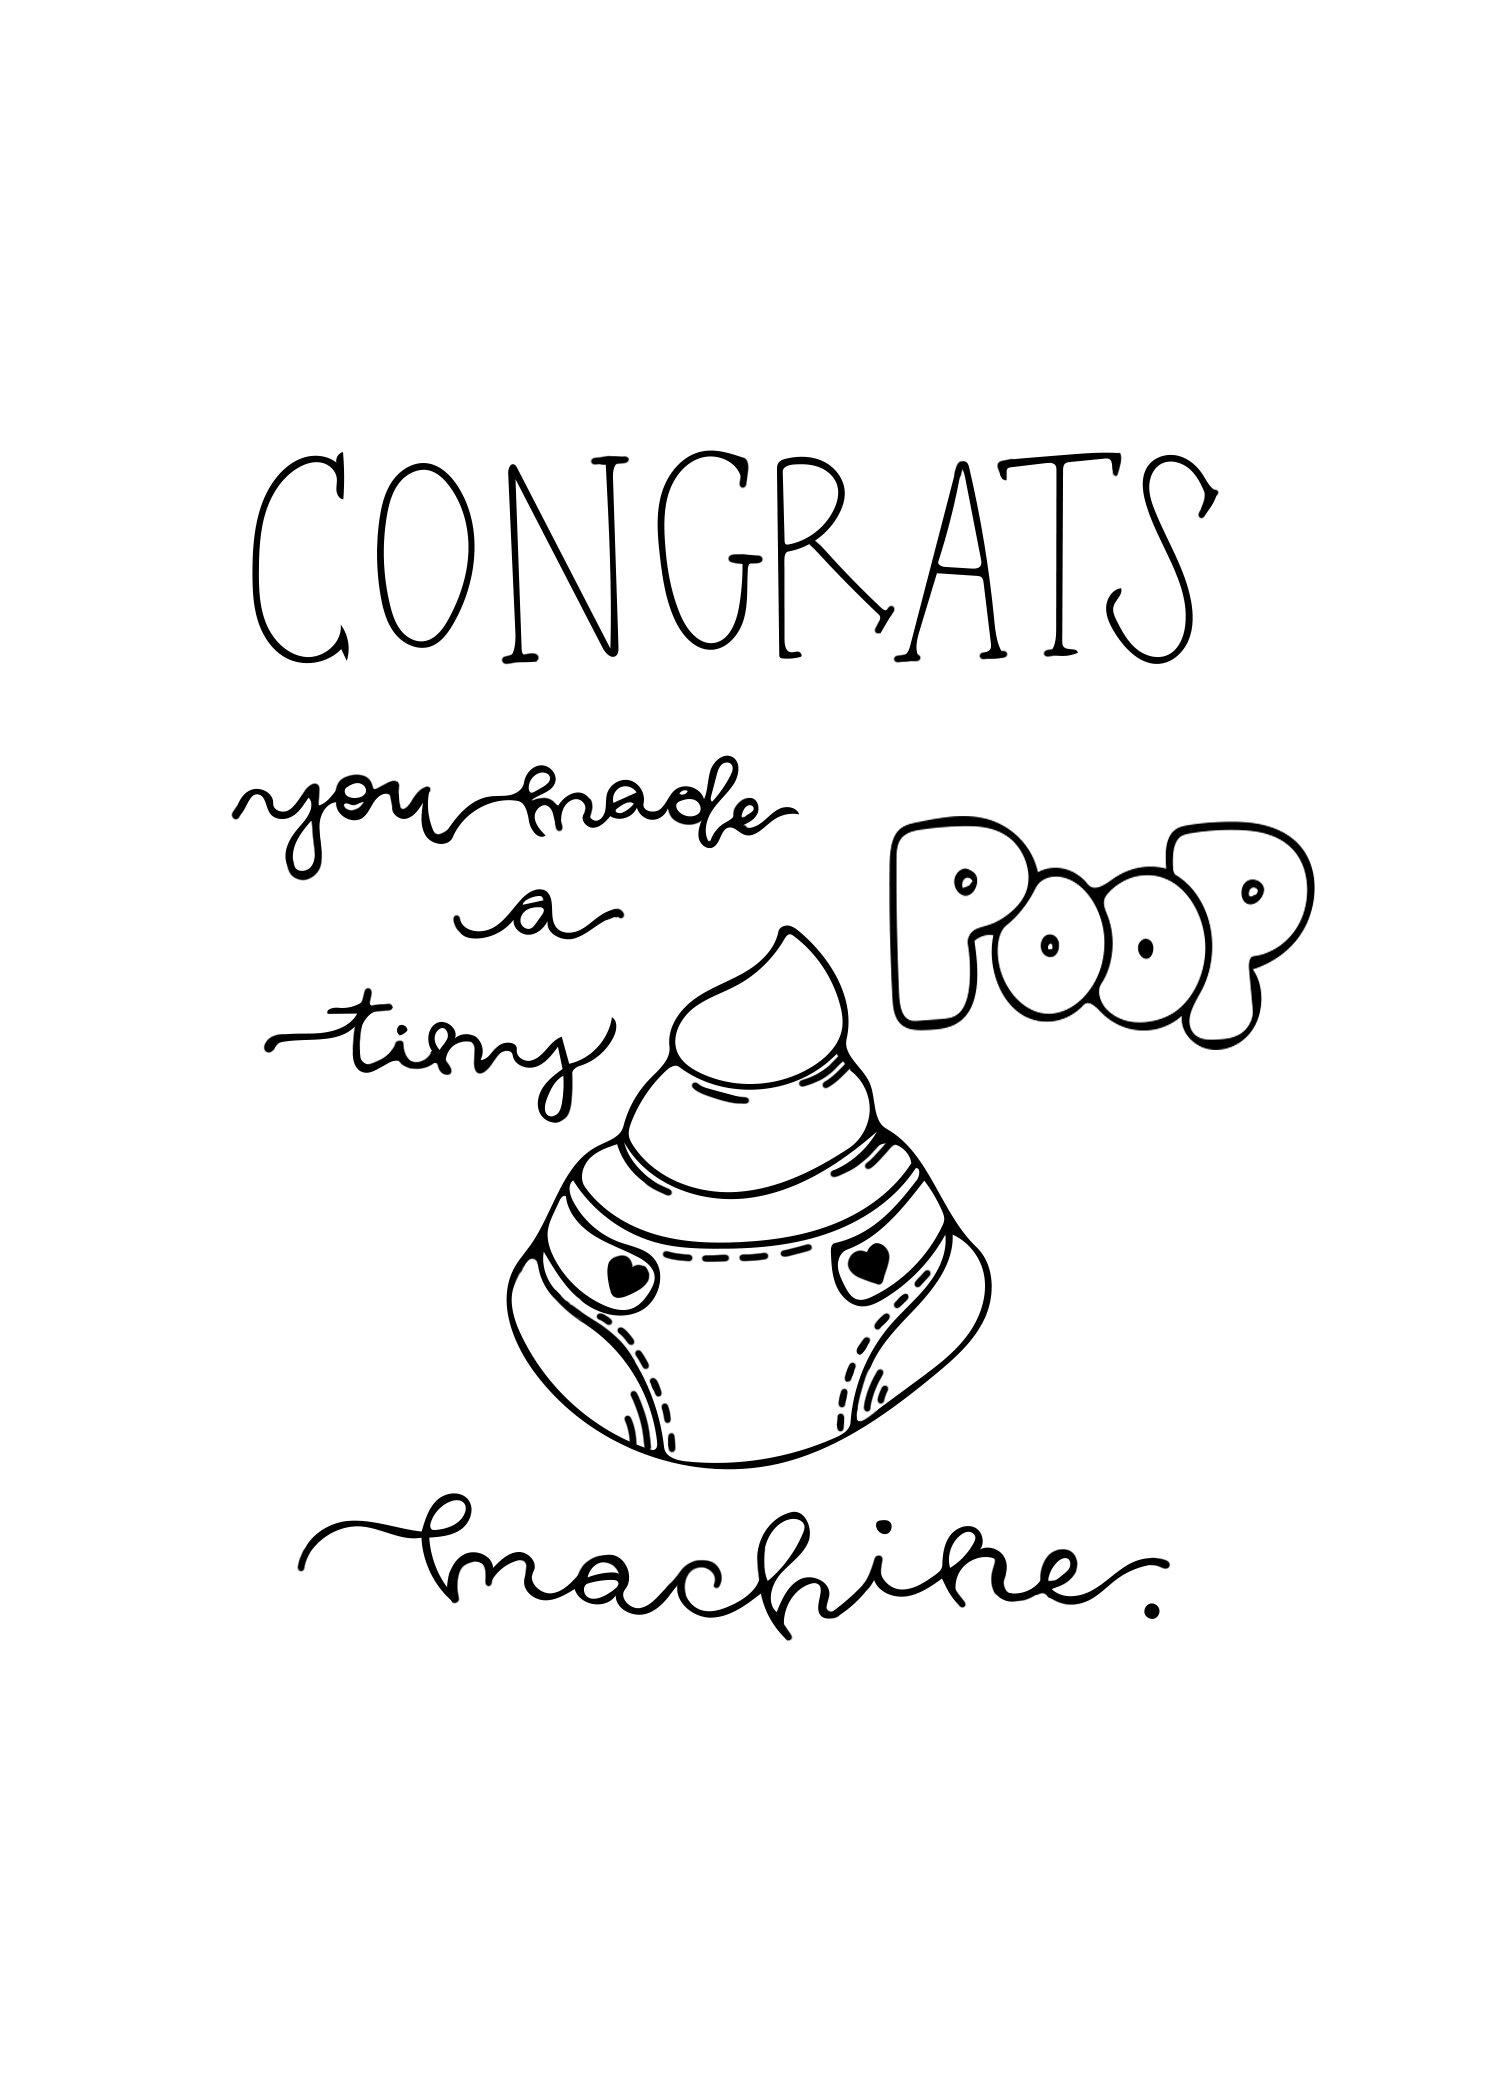 Congrats You Made a Tiny Poop Machine.jpg